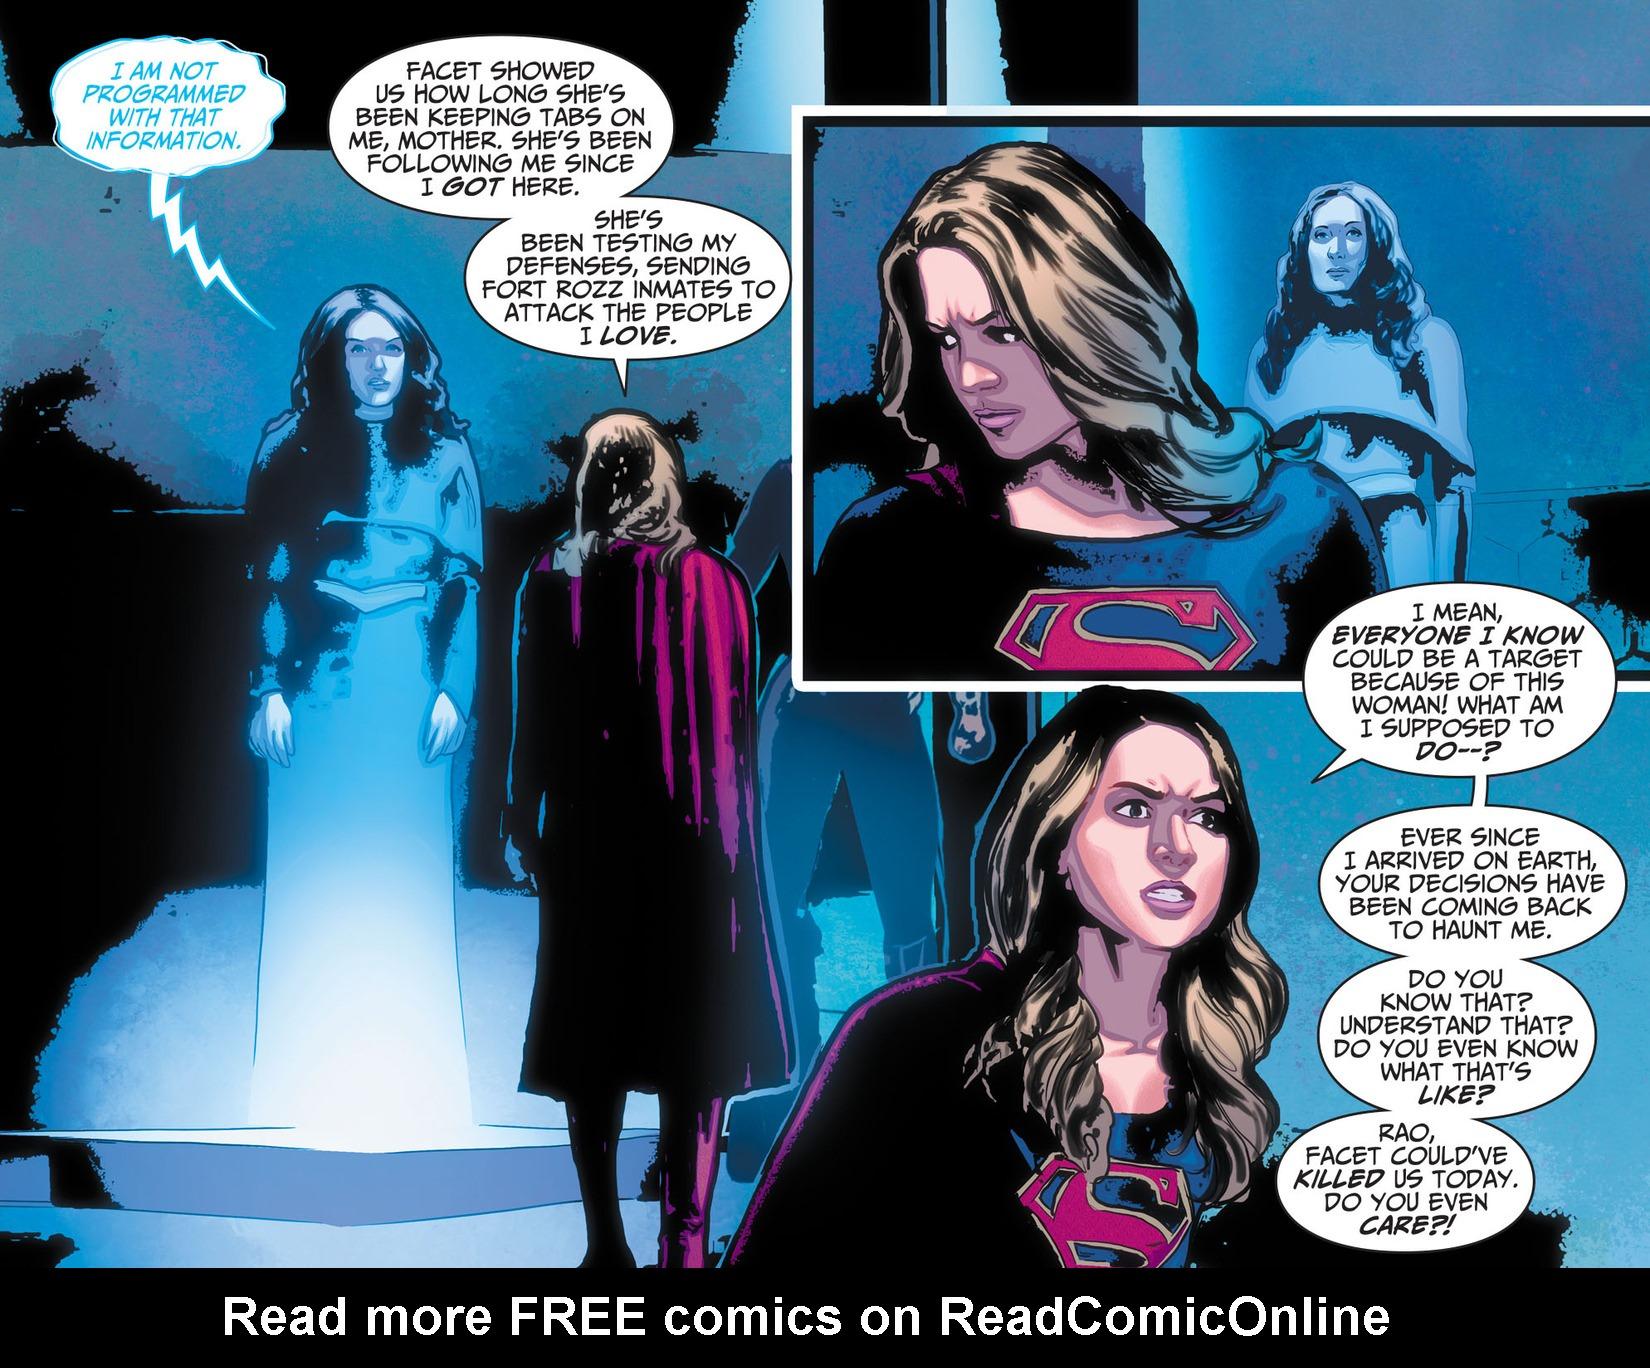 Read online Adventures of Supergirl comic -  Issue #10 - 19